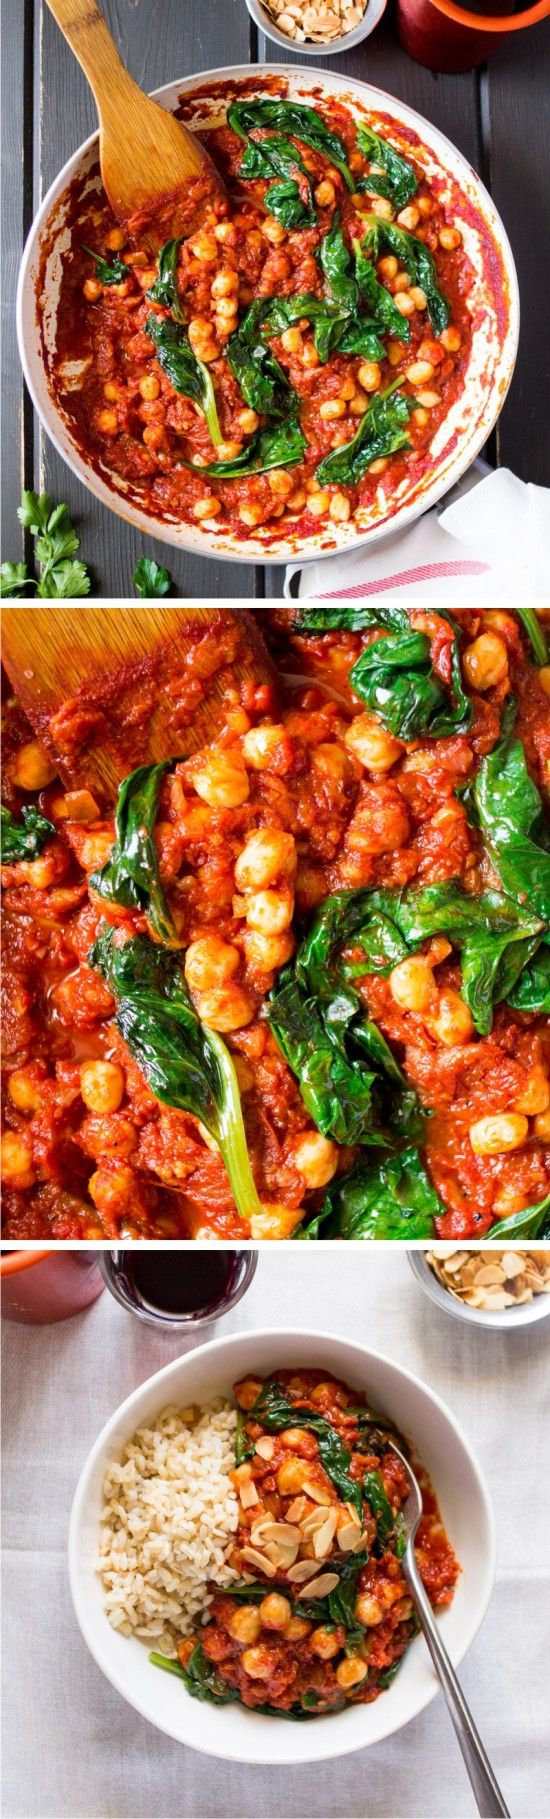 Spanish Spinach And Chickpea Stew Recipe — Dishmaps